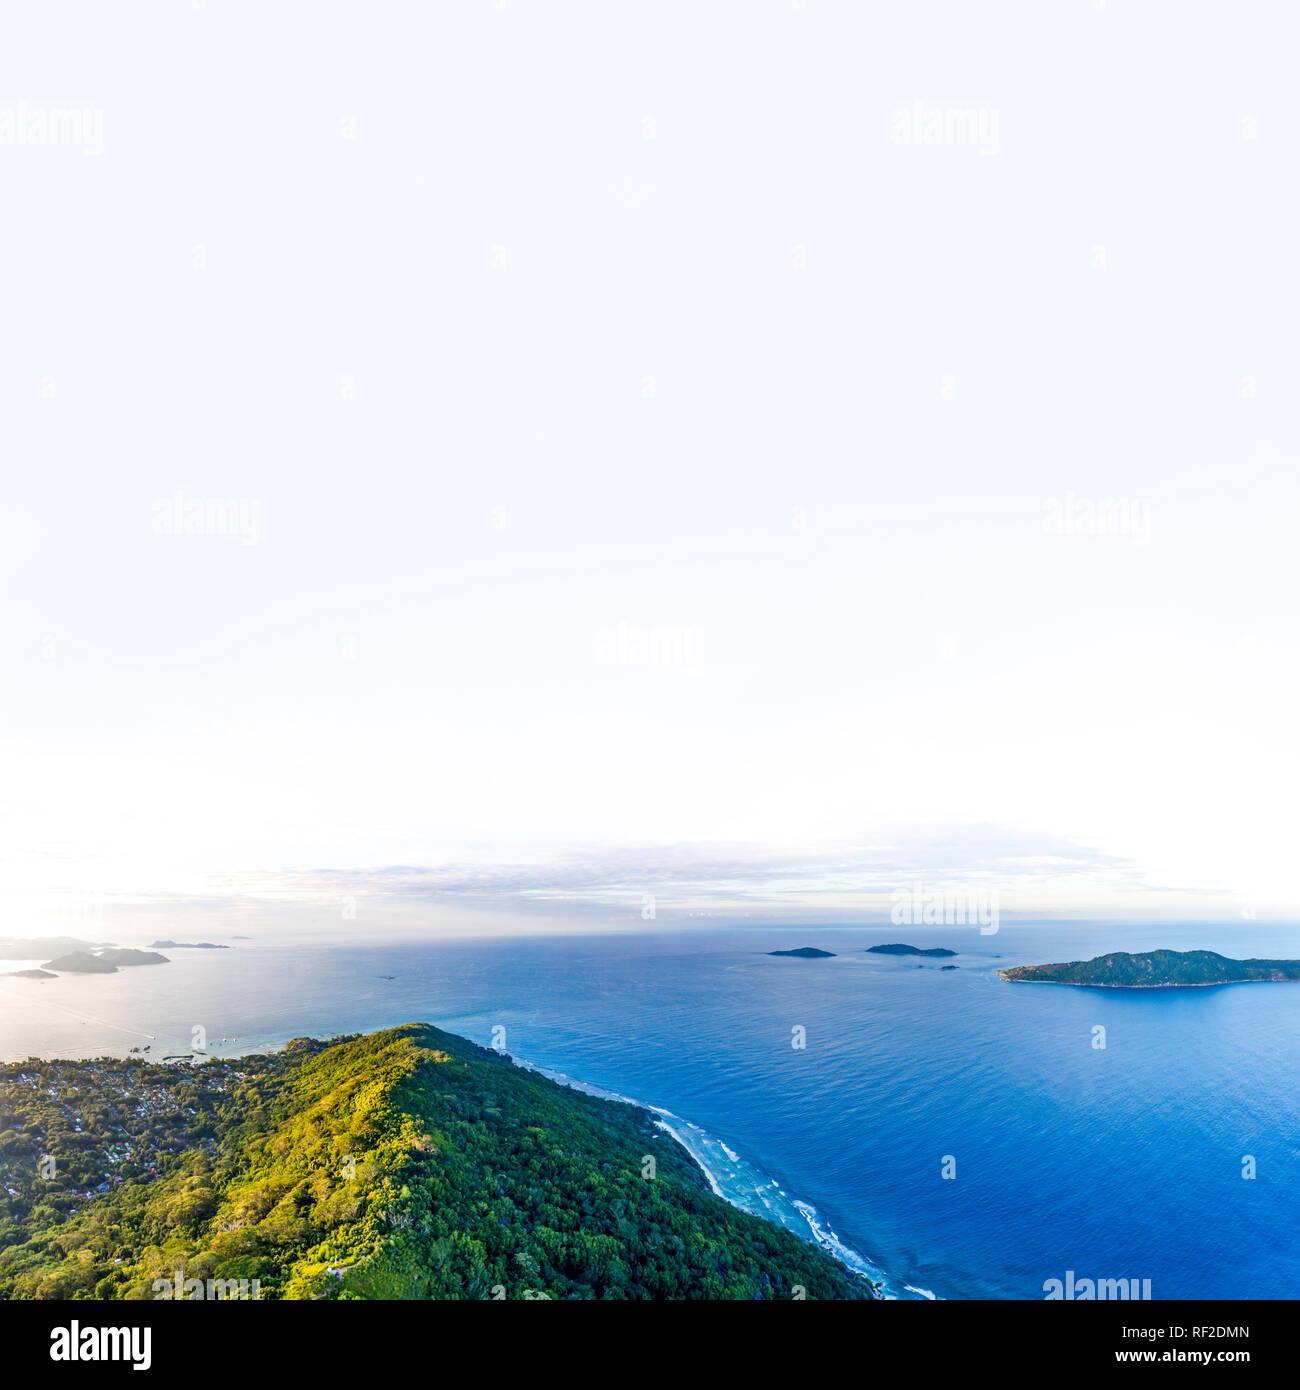 Seychelles, La Digue, Aerial view of Indian Ocean - Stock Image